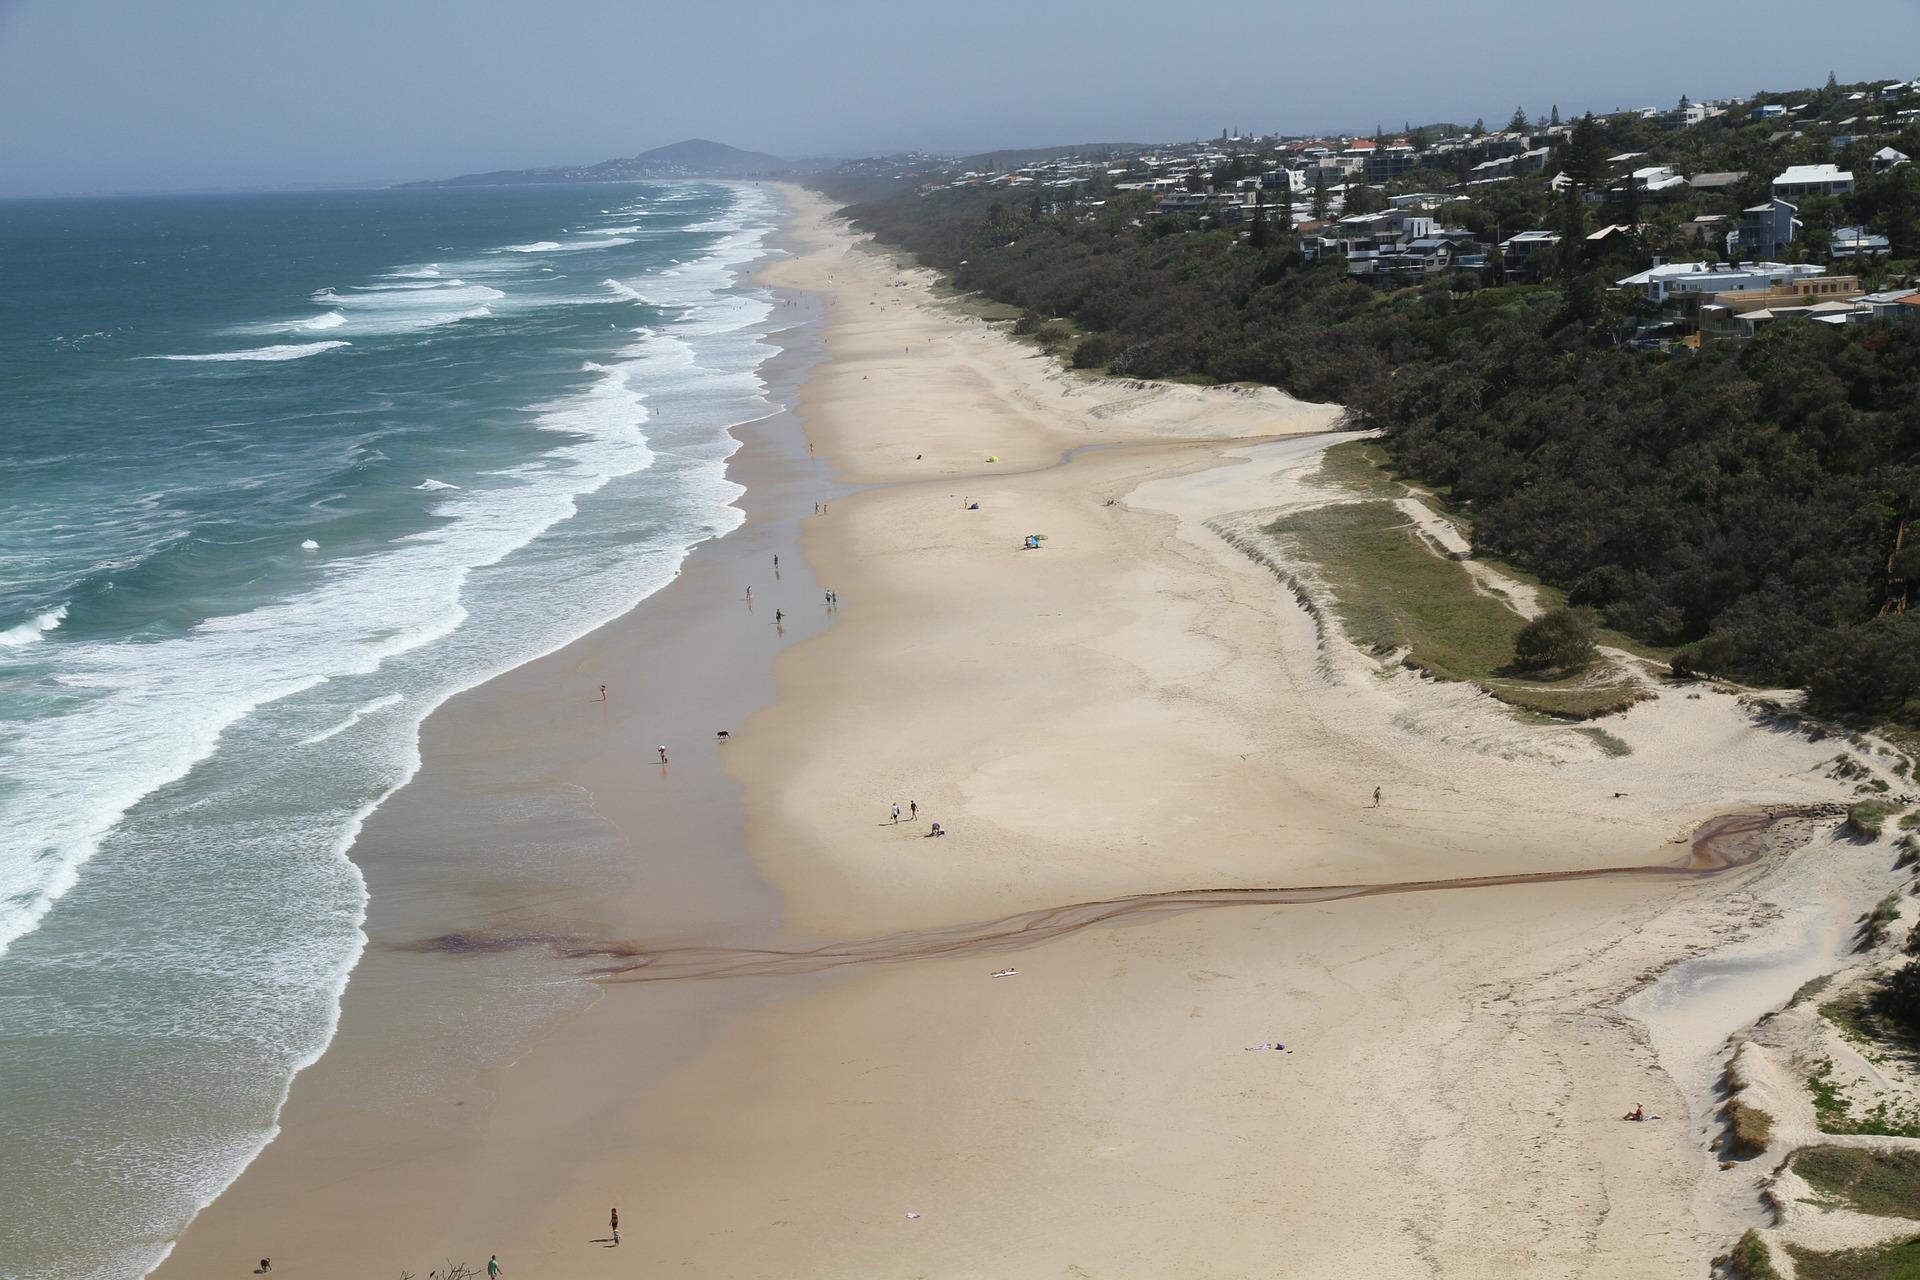 Vista aérea de la playa de Noosa, Australia